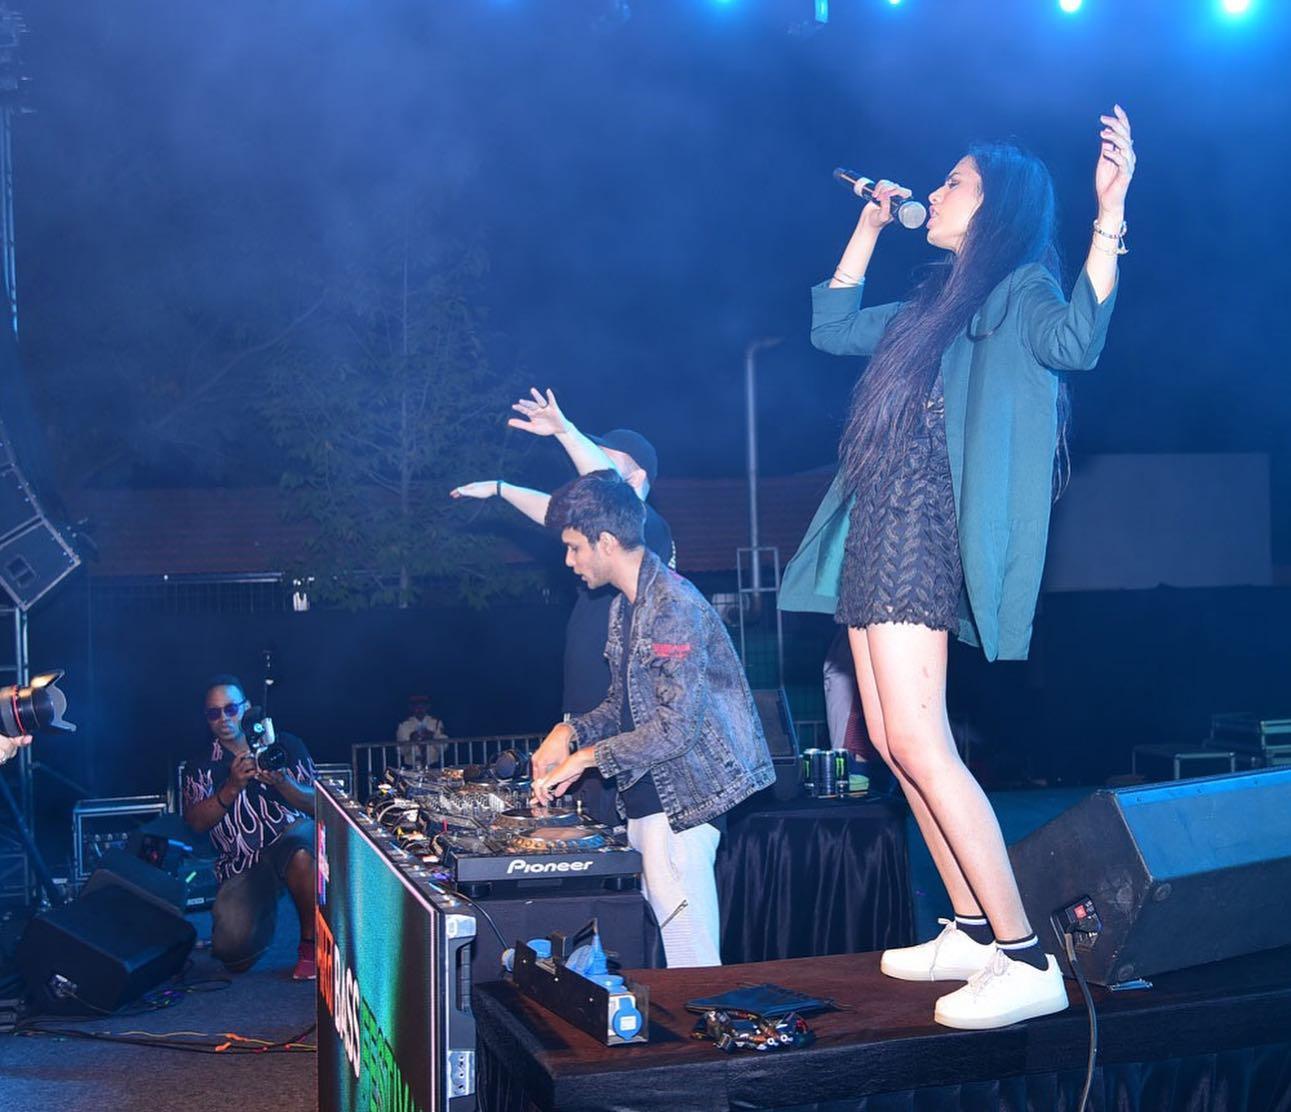 Nursing DJ show image 6